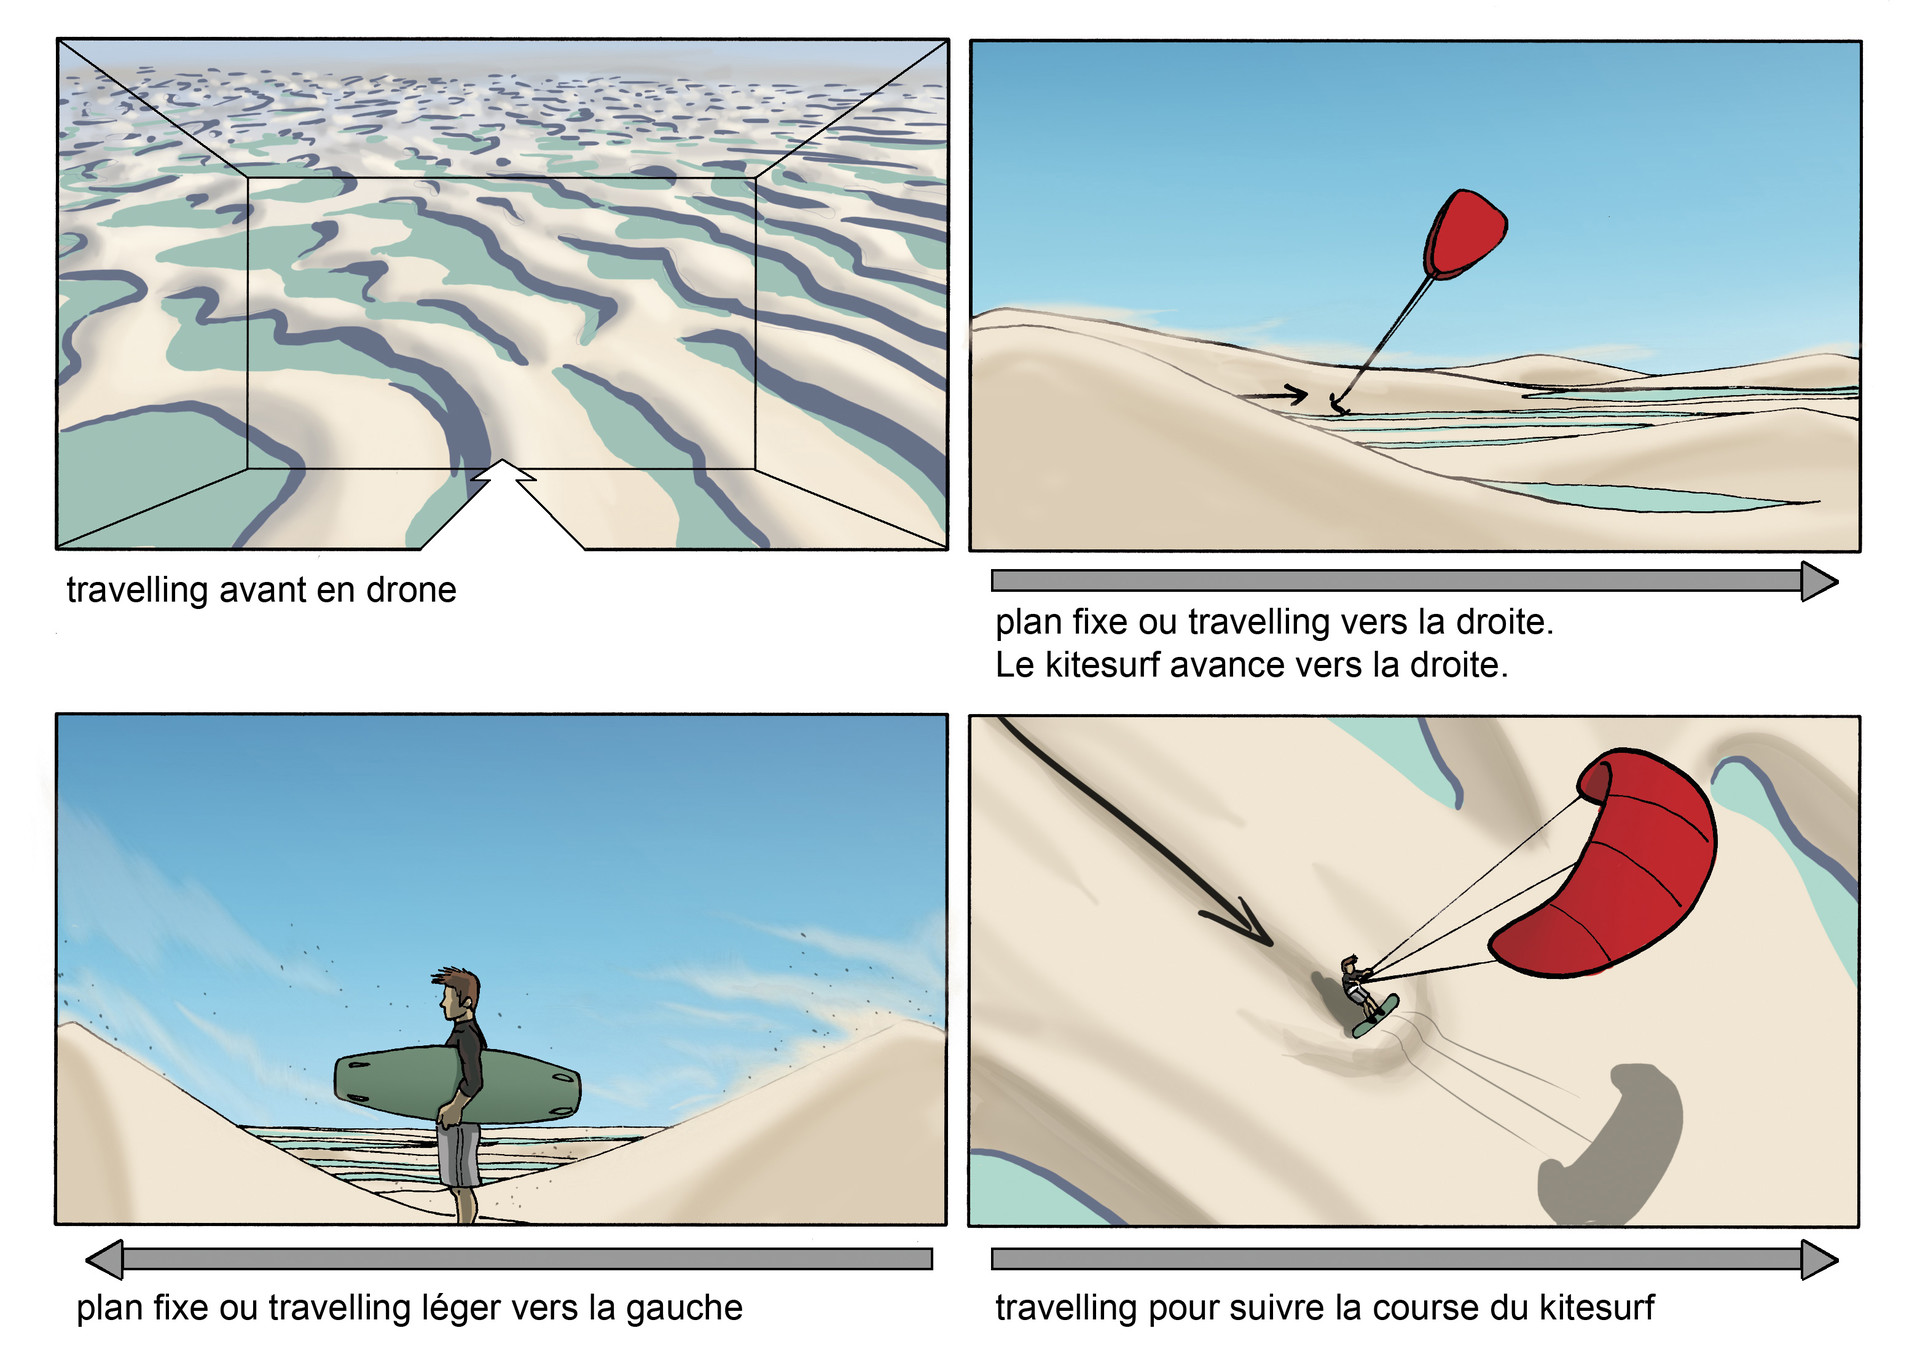 Nina hayer storyboard kitesurf 1